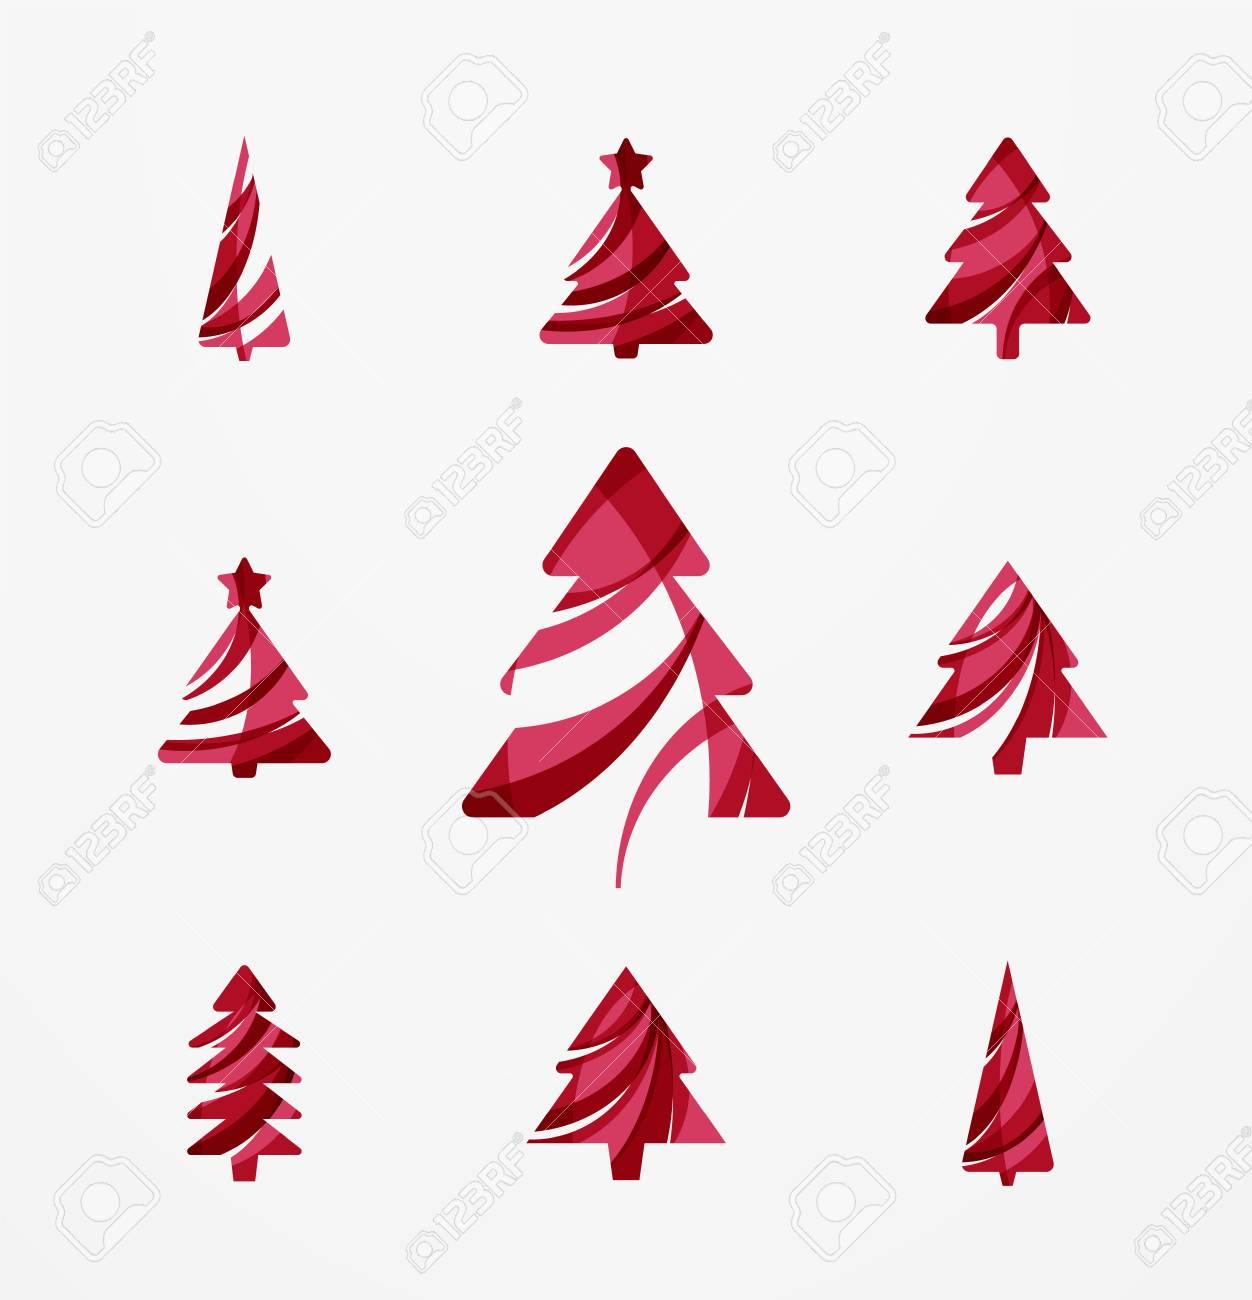 Christmas Tree Icons.Set Of Abstract Christmas Tree Icons Business Logo Concepts